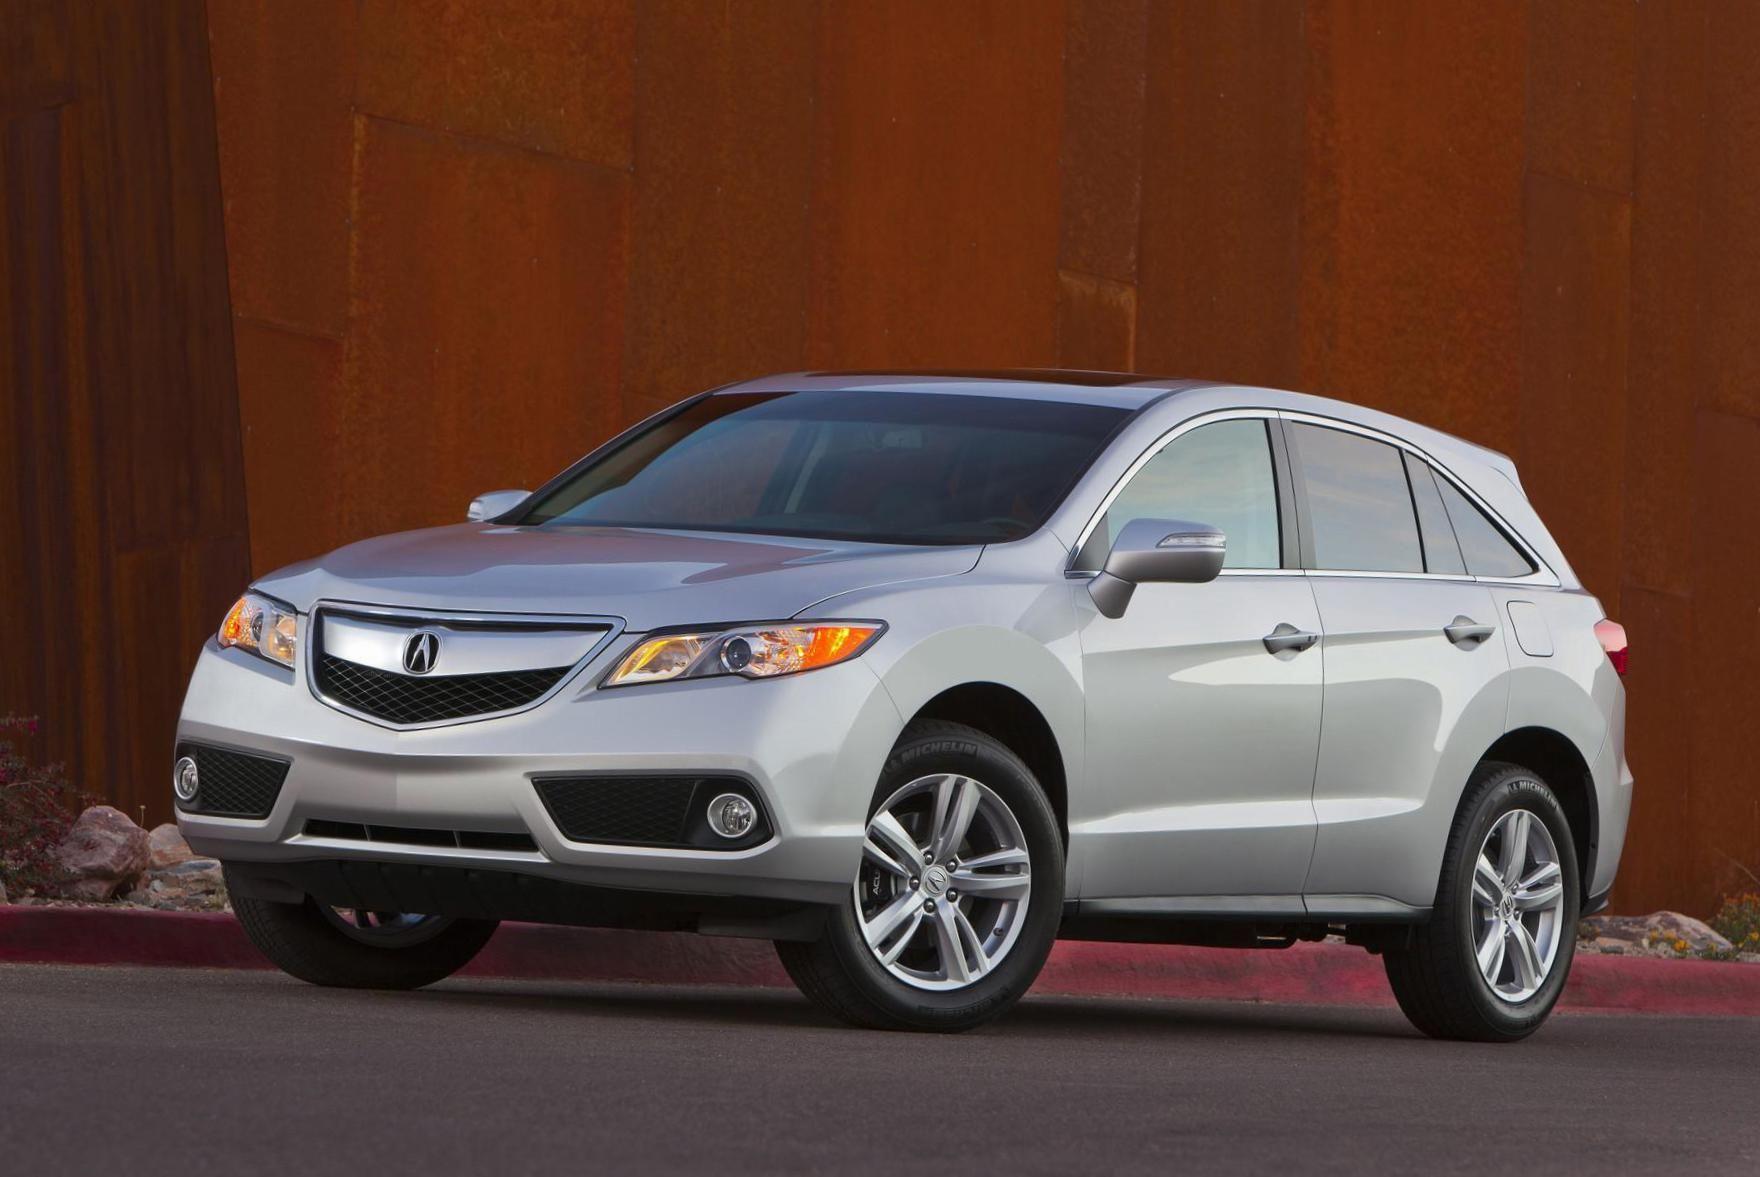 RDX Acura Lease Httpautotrascom Auto Pinterest Acura - Best acura rdx lease deals